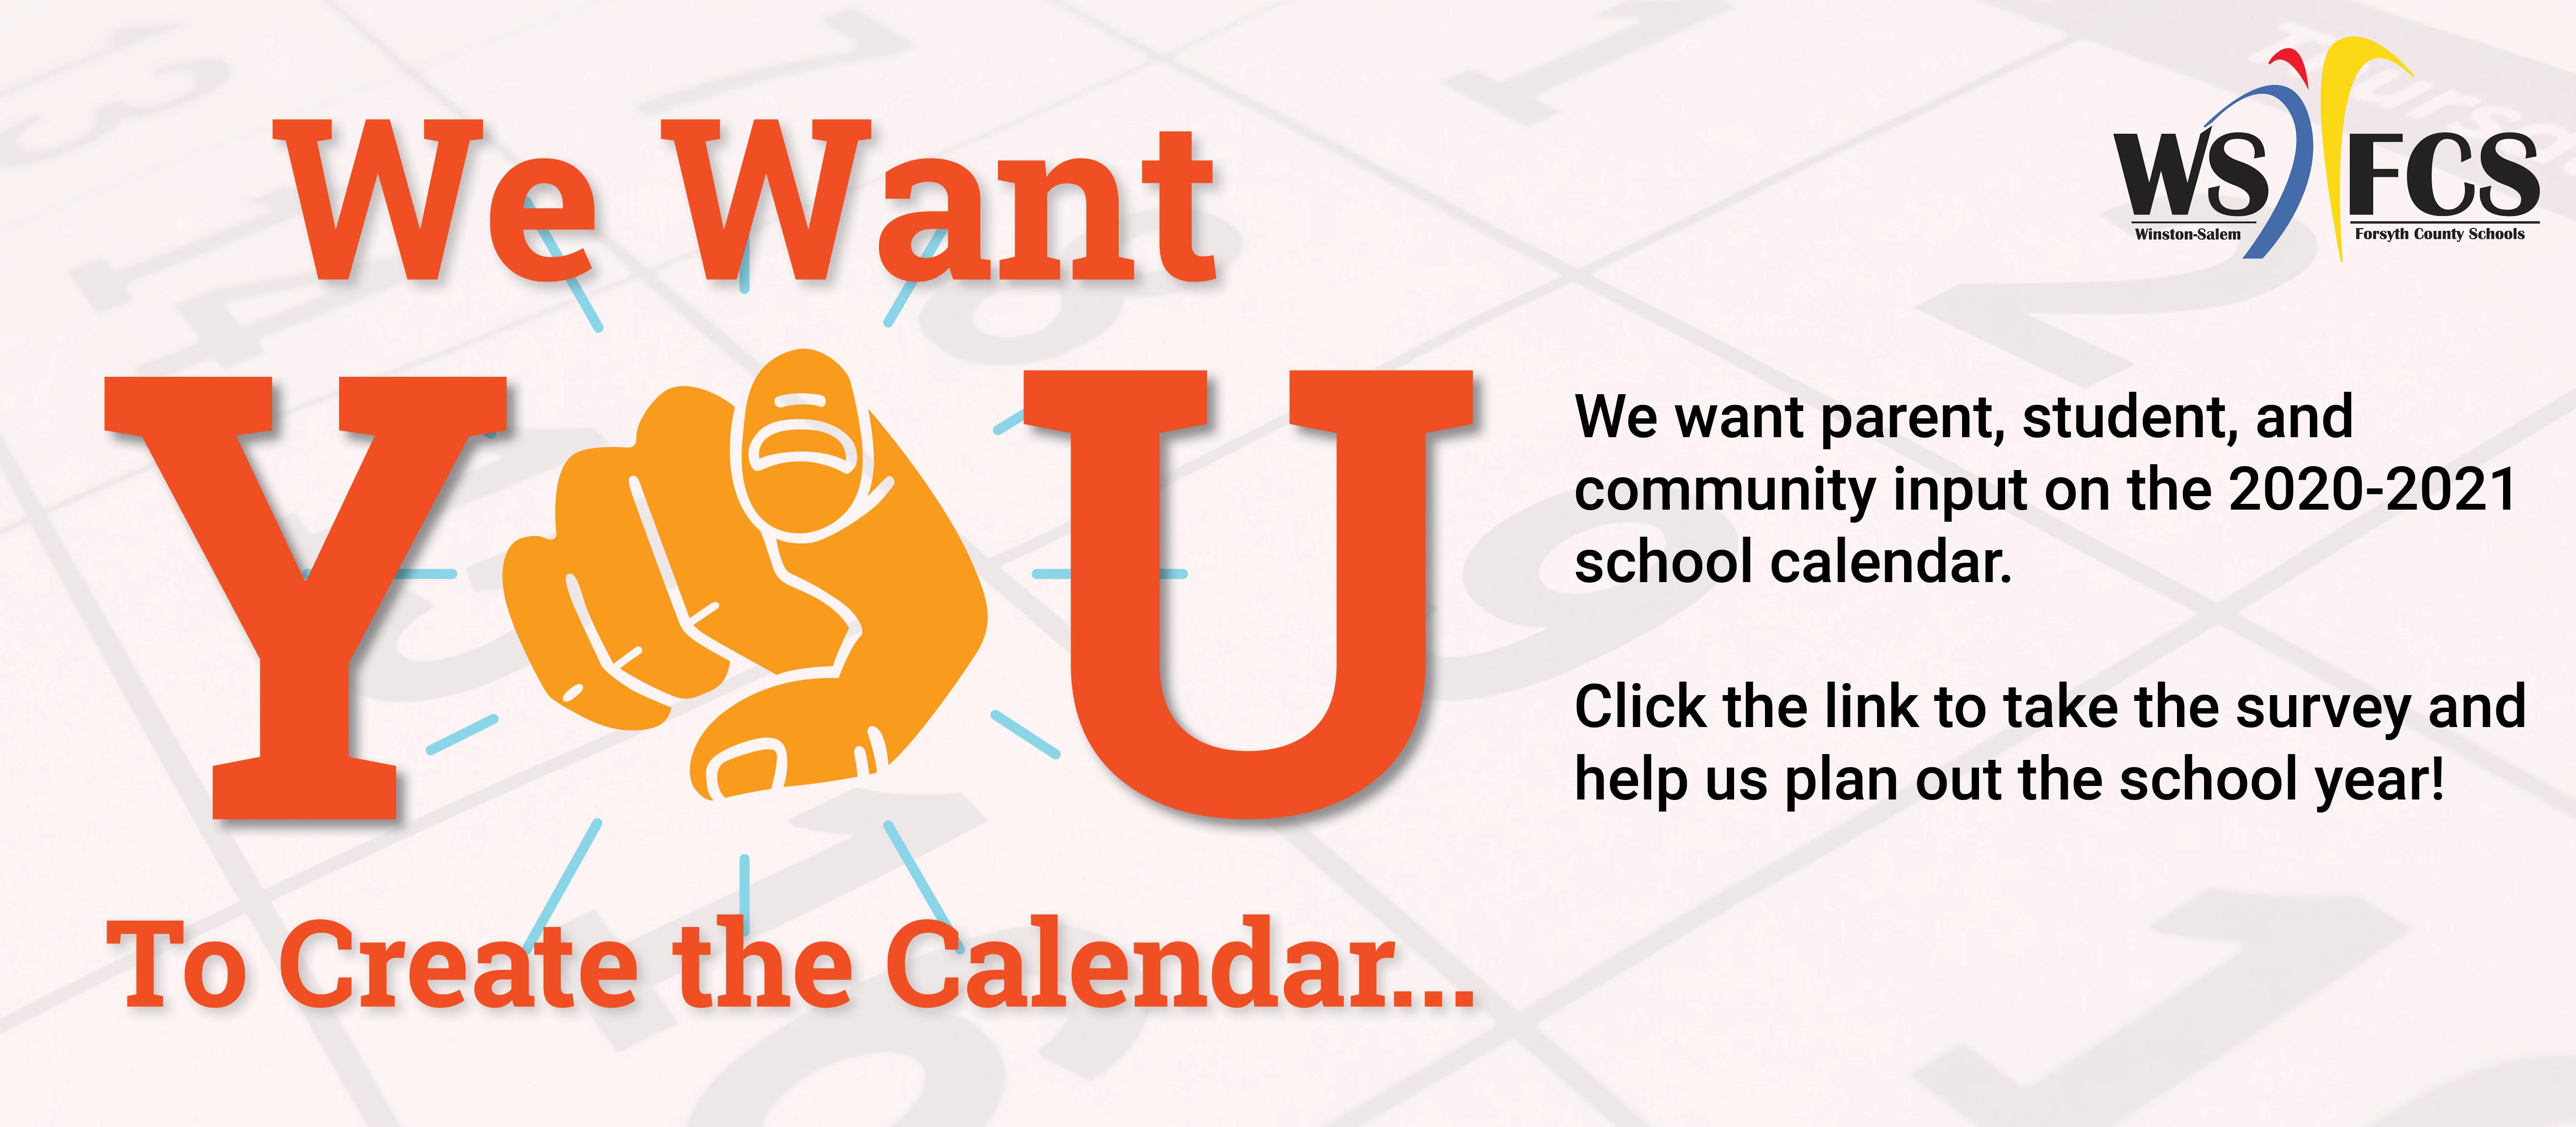 Wsfcs Calendar 2016 2020 Winston Salem/Forsyth County Schools / Front Page